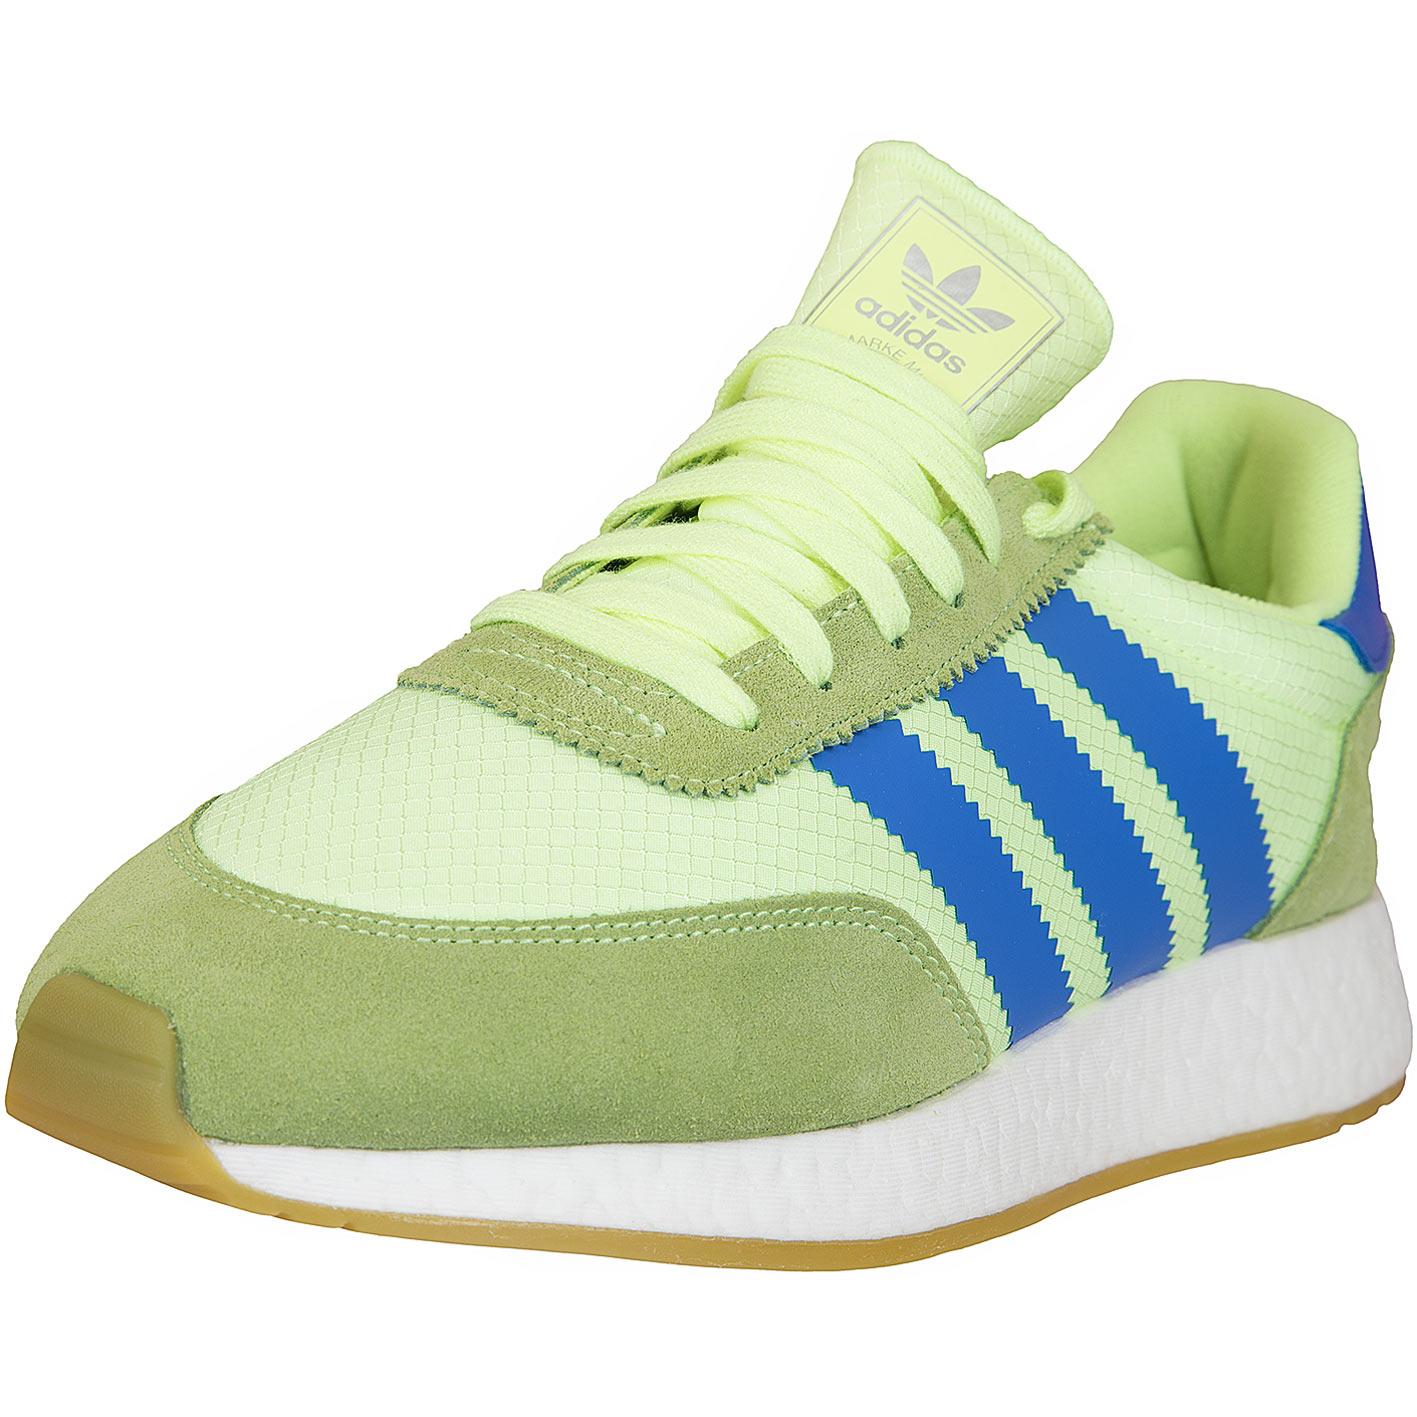 Adidas Originals Sneaker I 5923 grünblau